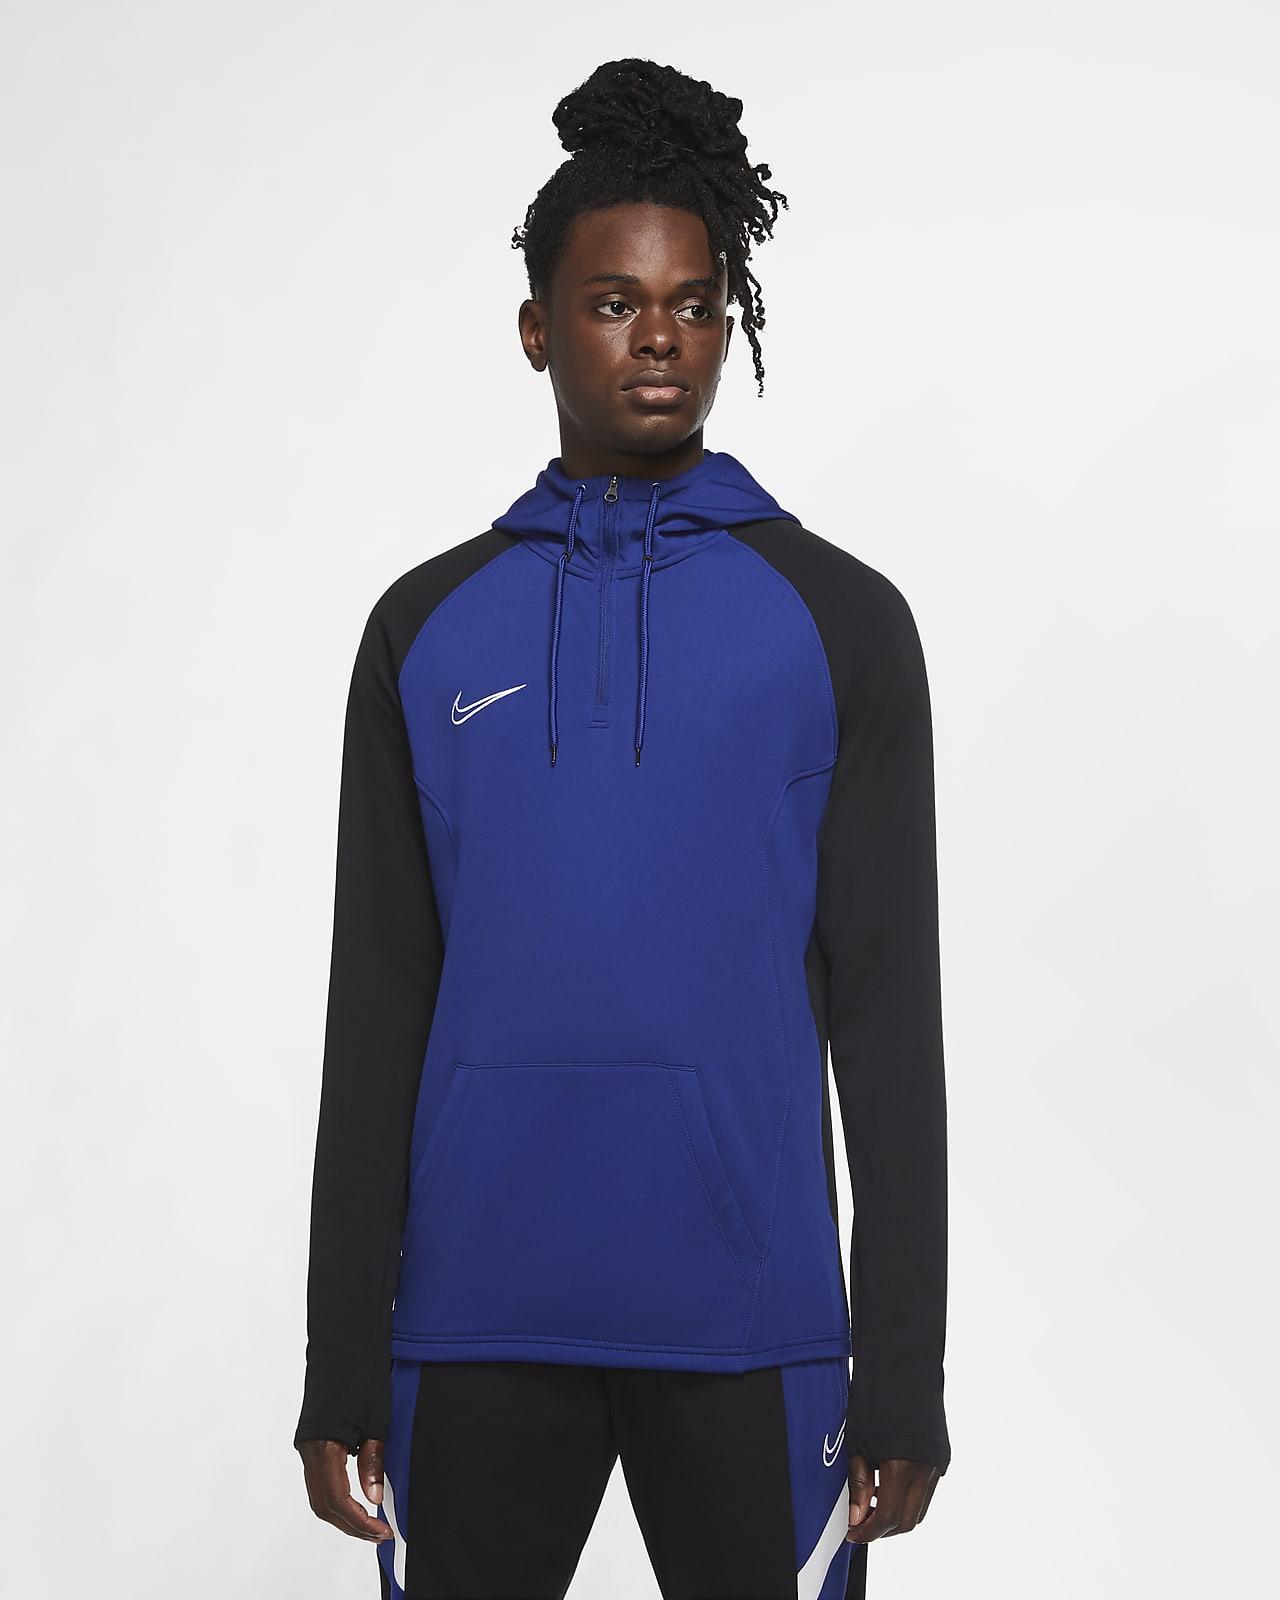 Nike Dri-FIT Academy Men's 1/4-Zip Football Drill Hoodie